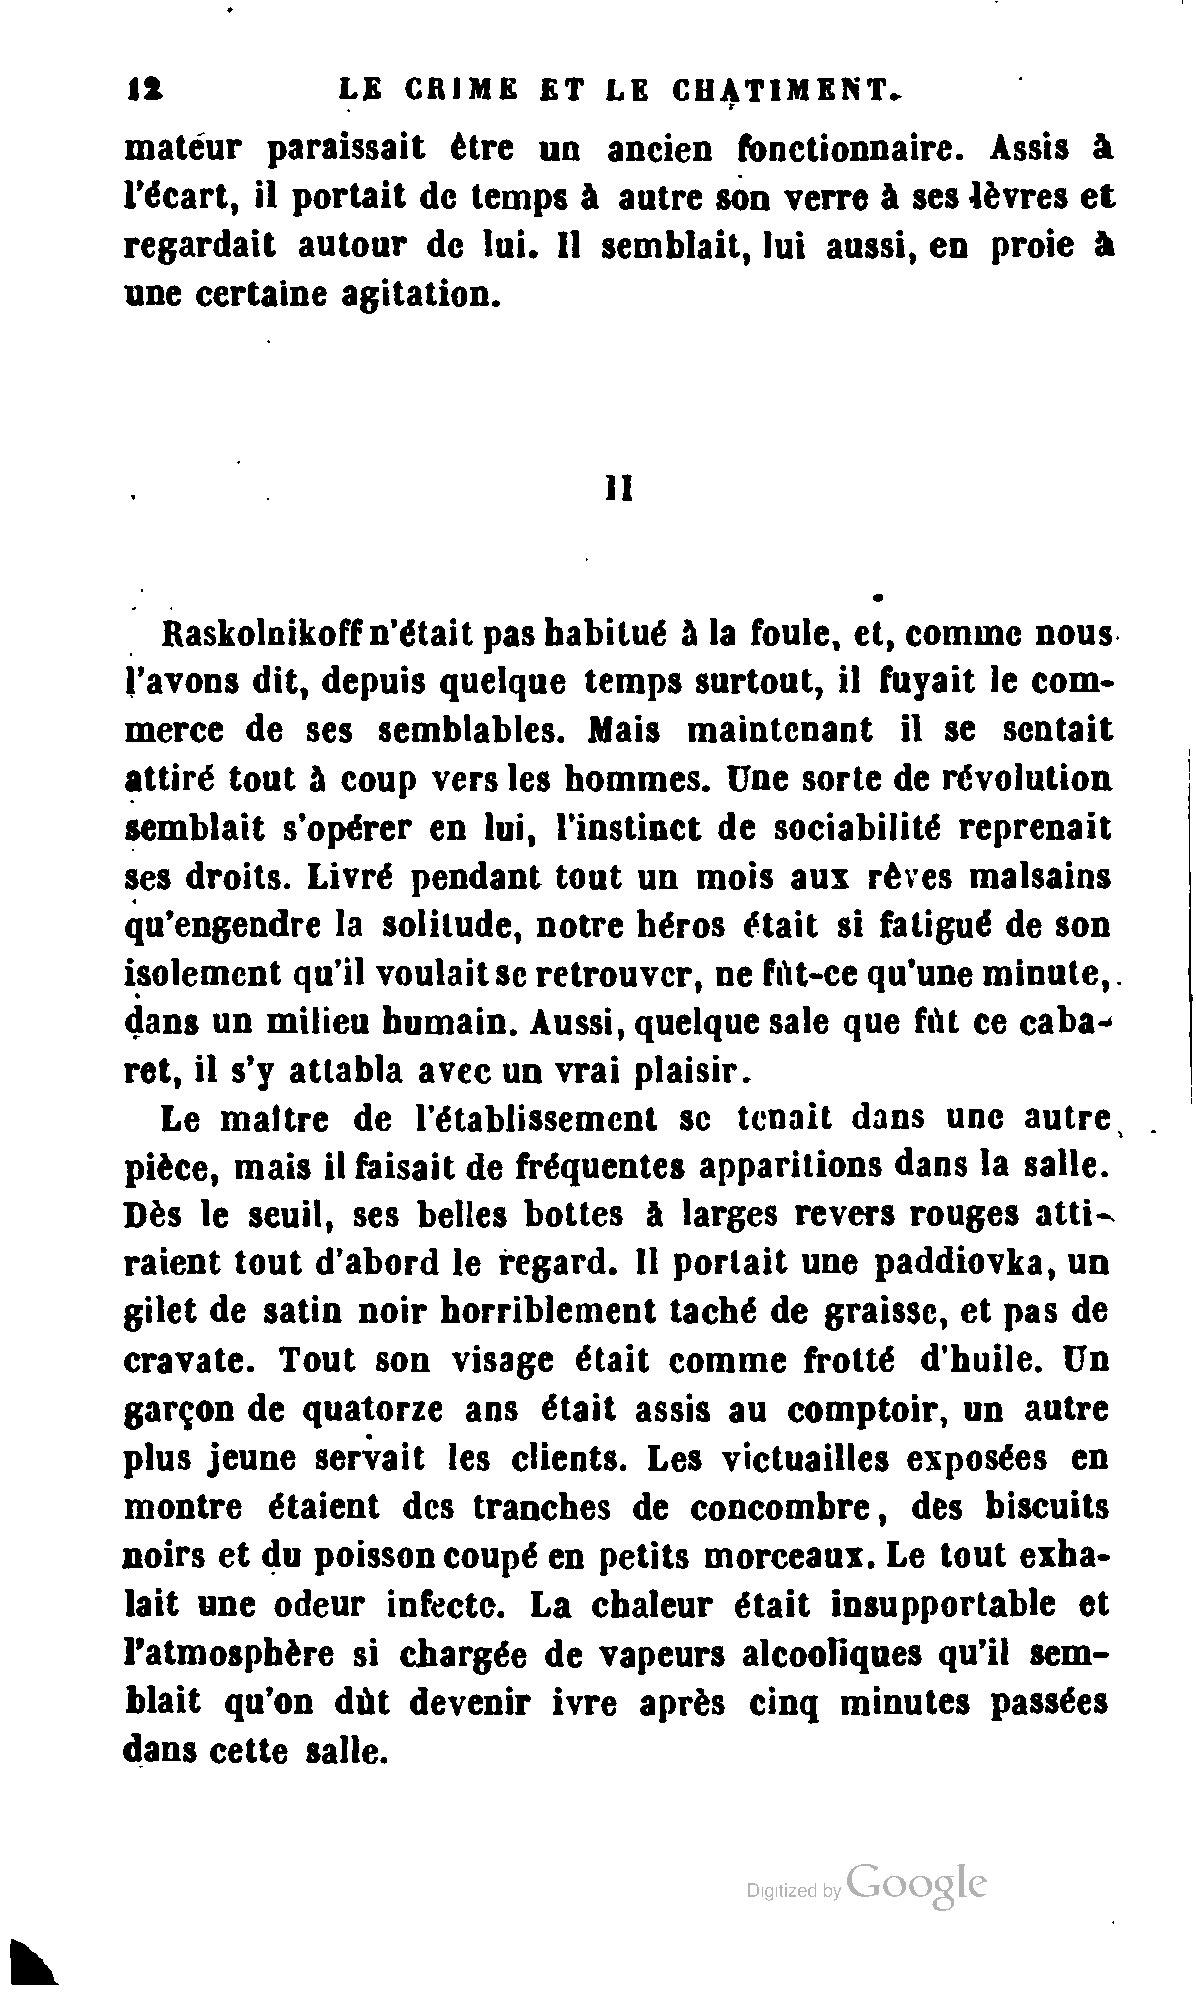 Page dosto evski crime et chatiment tome wikisource - Coup de chaleur wikipedia ...